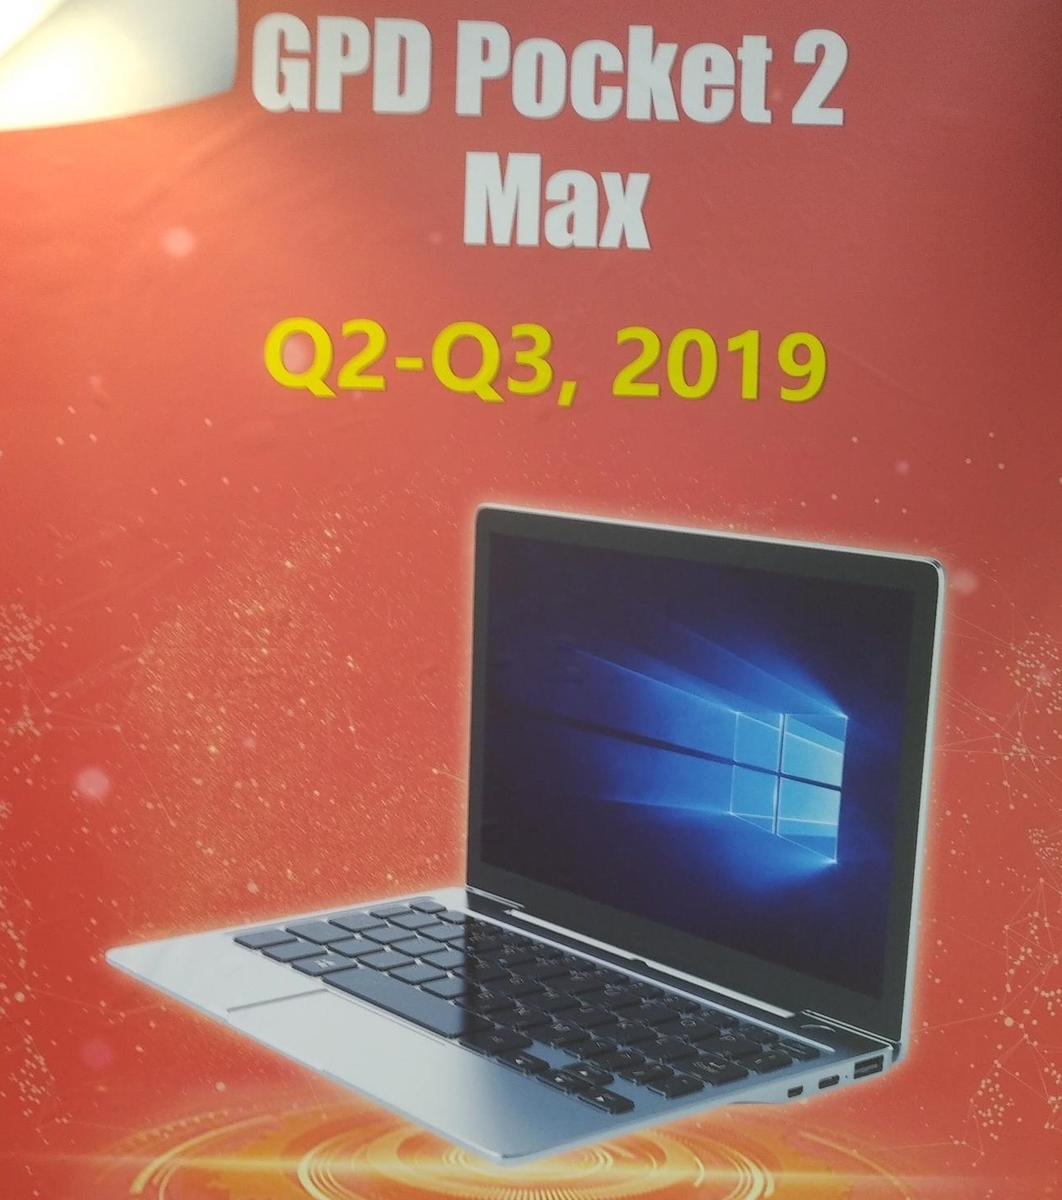 GPD Pocket 2 Max